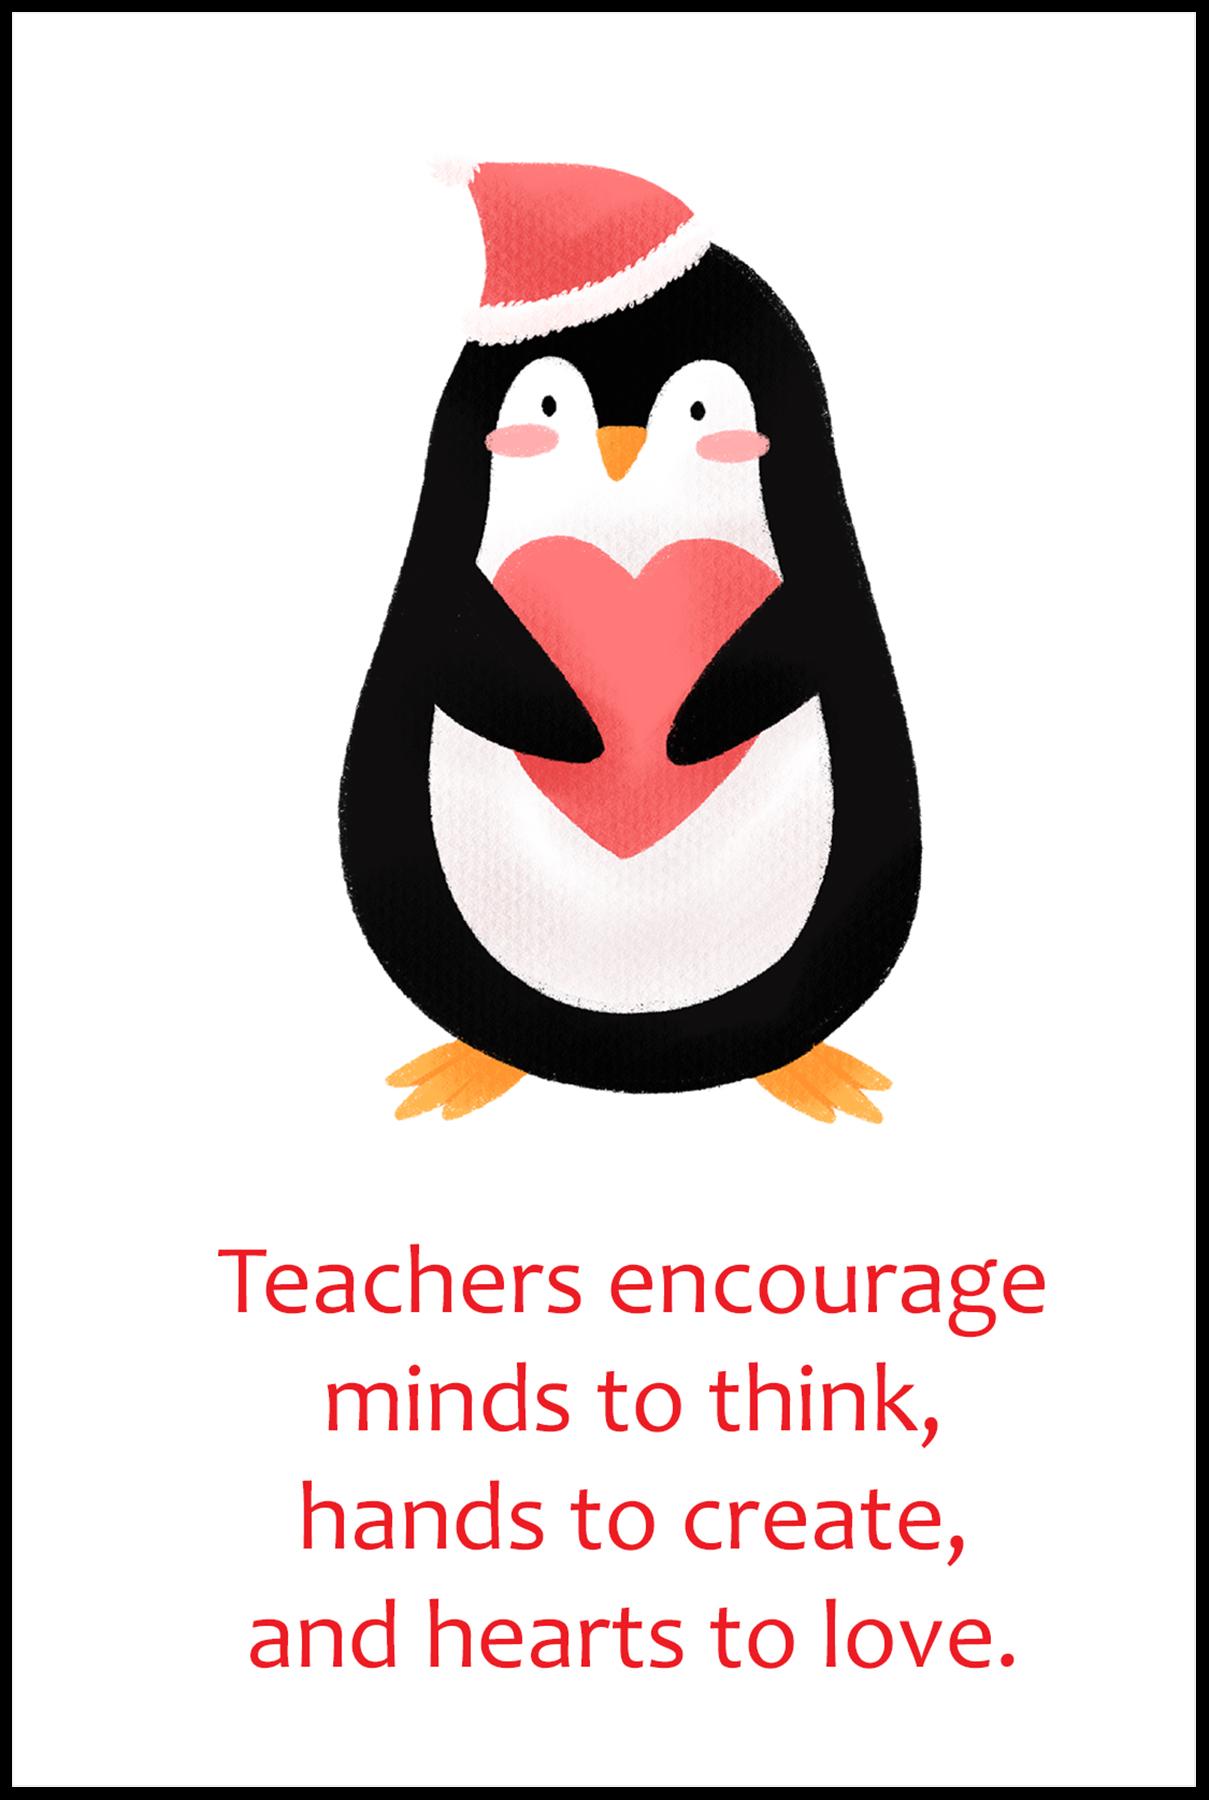 Teachers Encourage Minds to Think